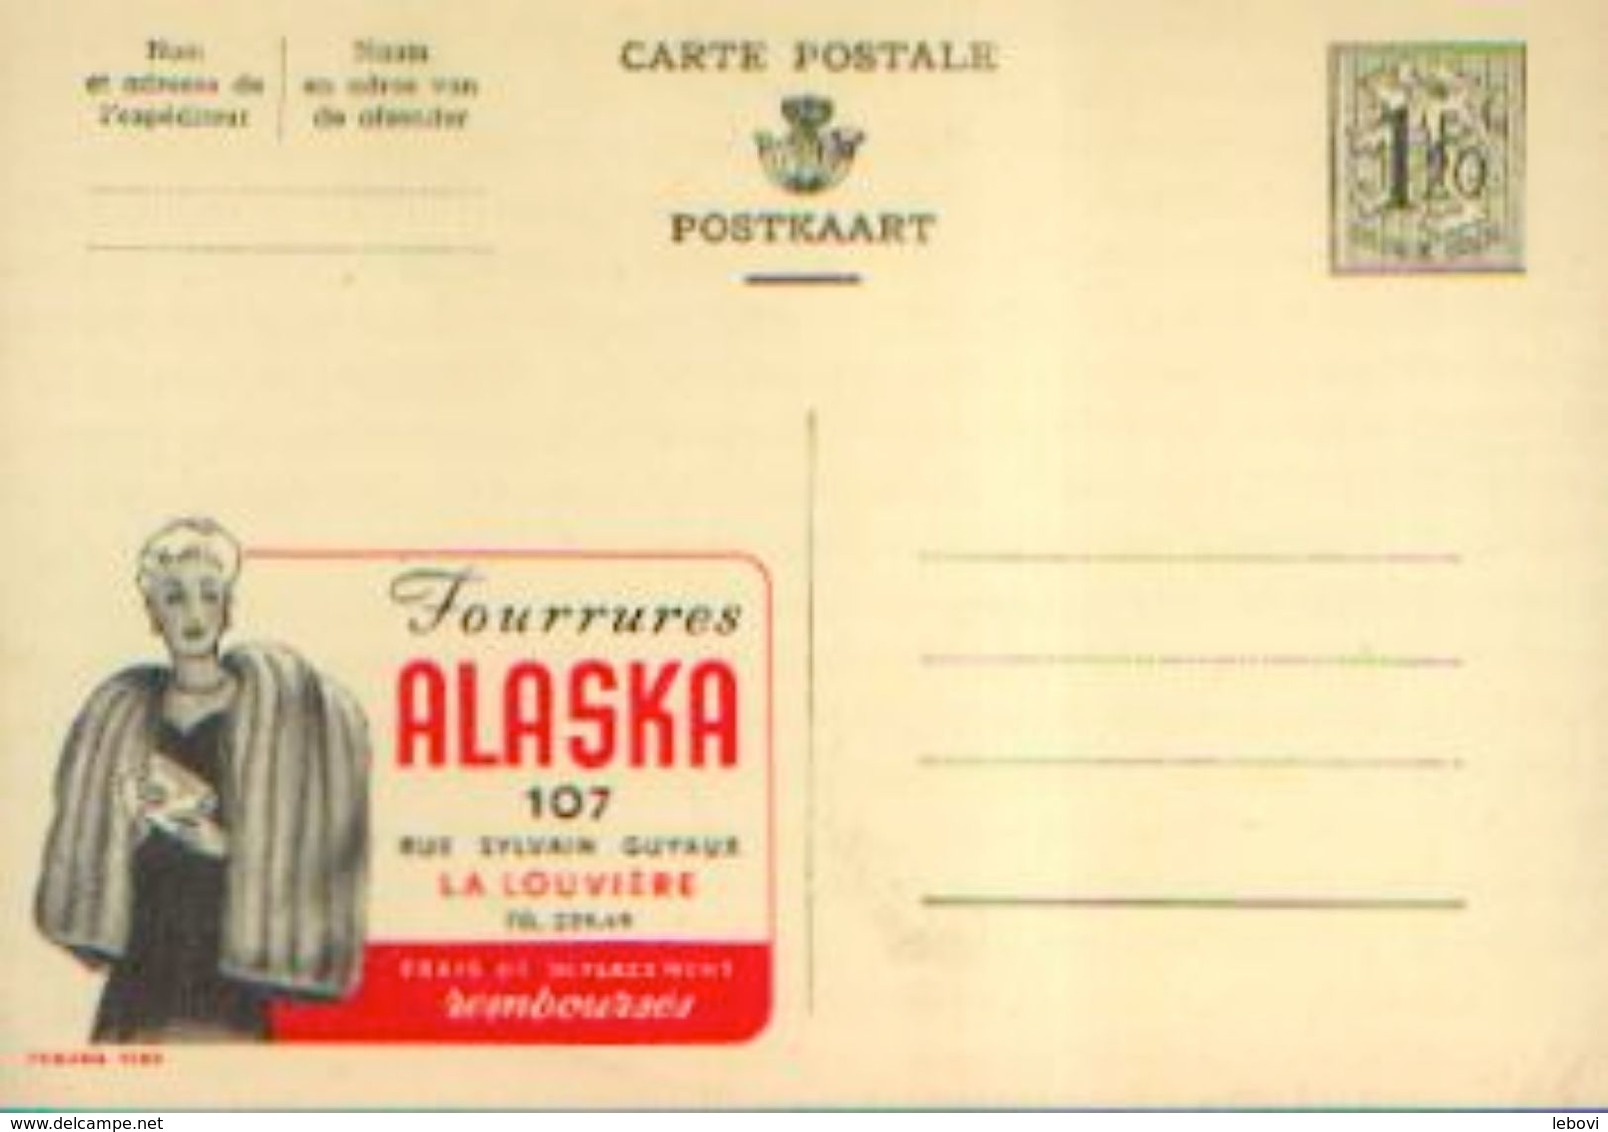 Carte Postale Neuve – PUBLIBEL N° 1280 « Fourrures Alaska – LA LOUVIERE » - Stamped Stationery